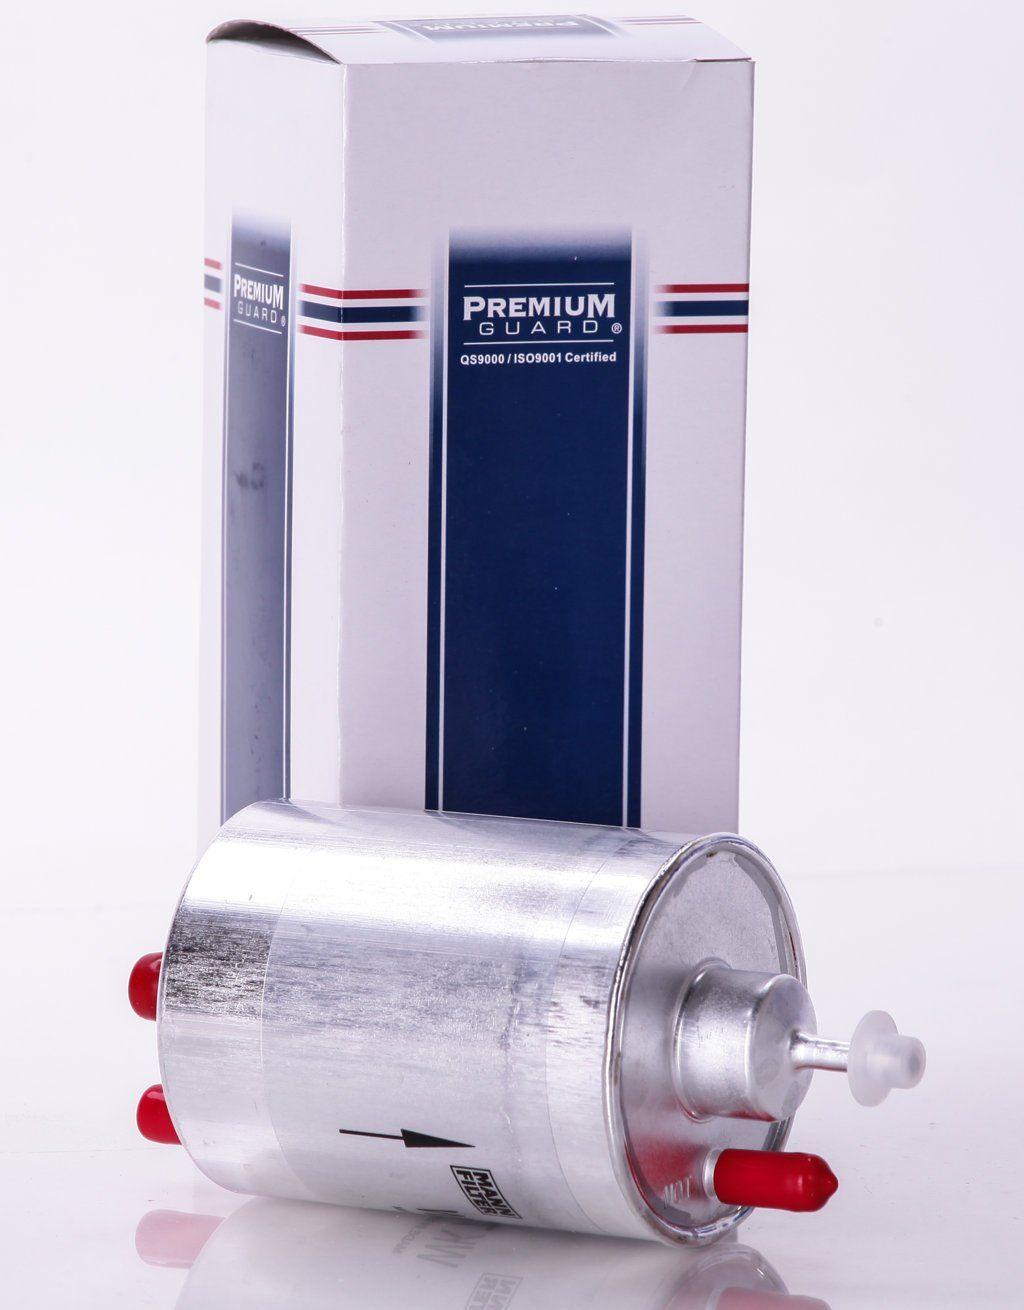 2004 Chrysler Crossfire Fuel Filter 6 Cyl 3.2L (Premium Guard PF5416)